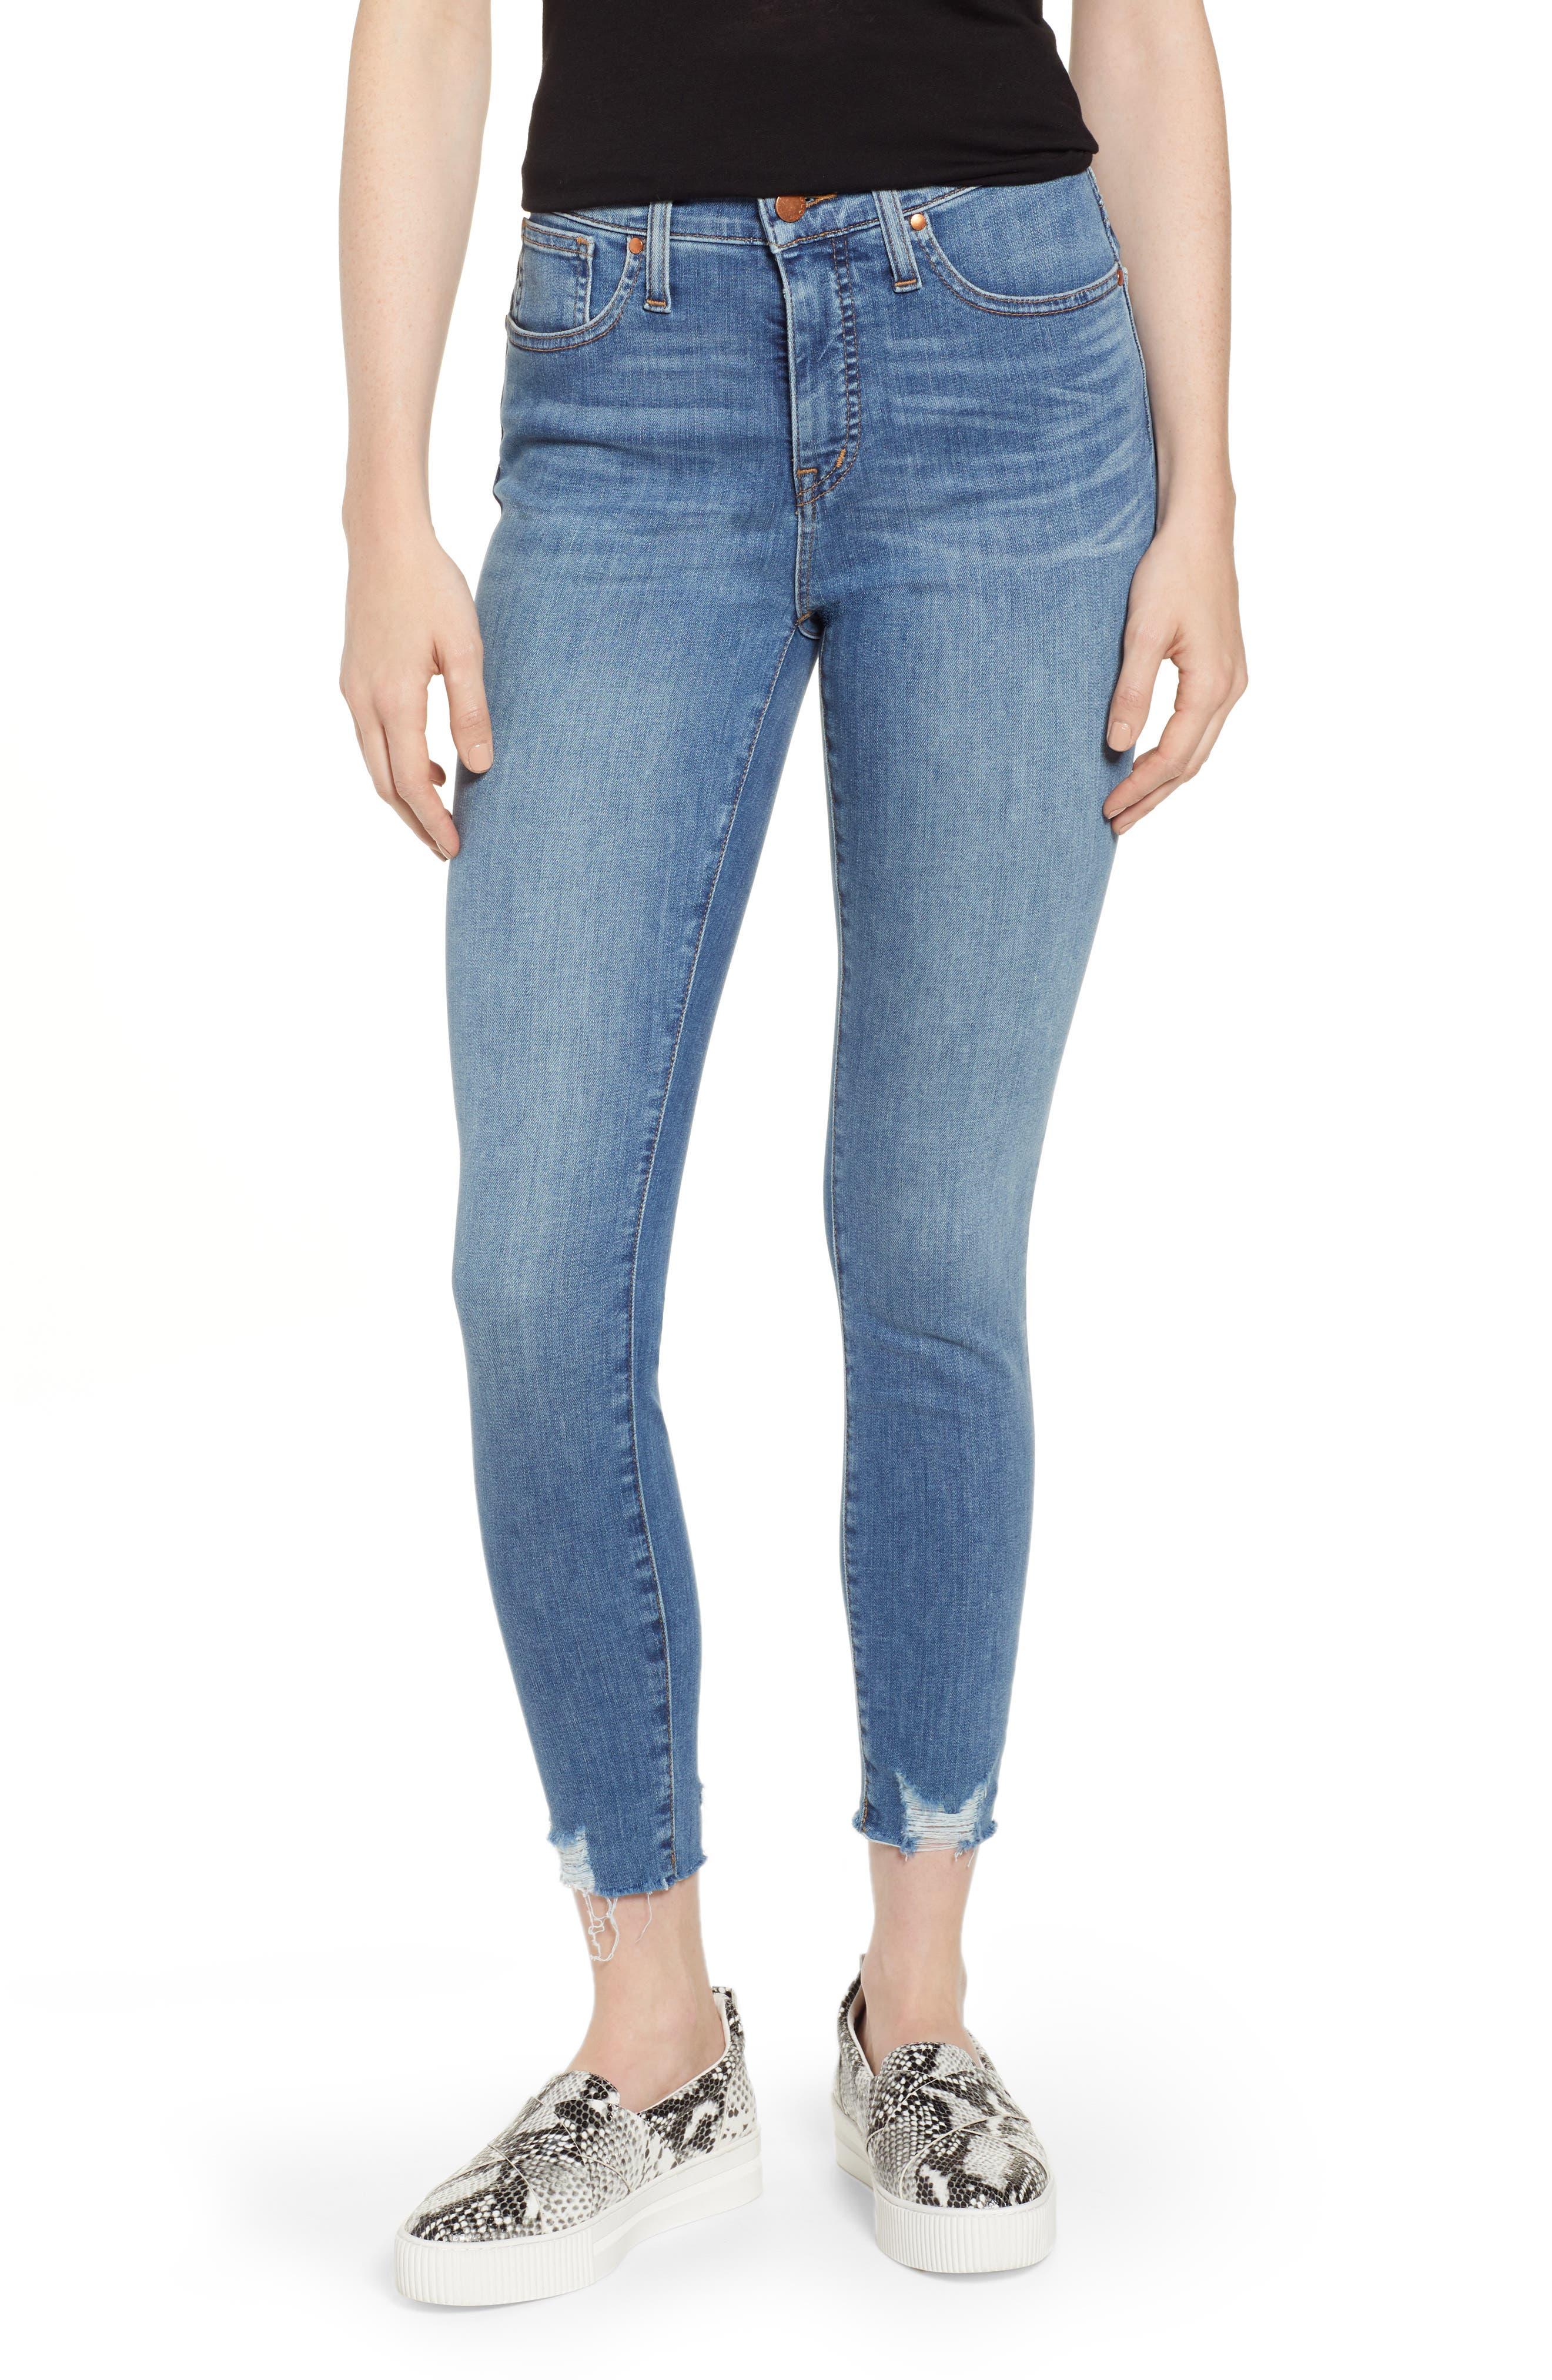 Sierra High Waist Raw Hem Skinny Jeans, Main, color, NORIKO